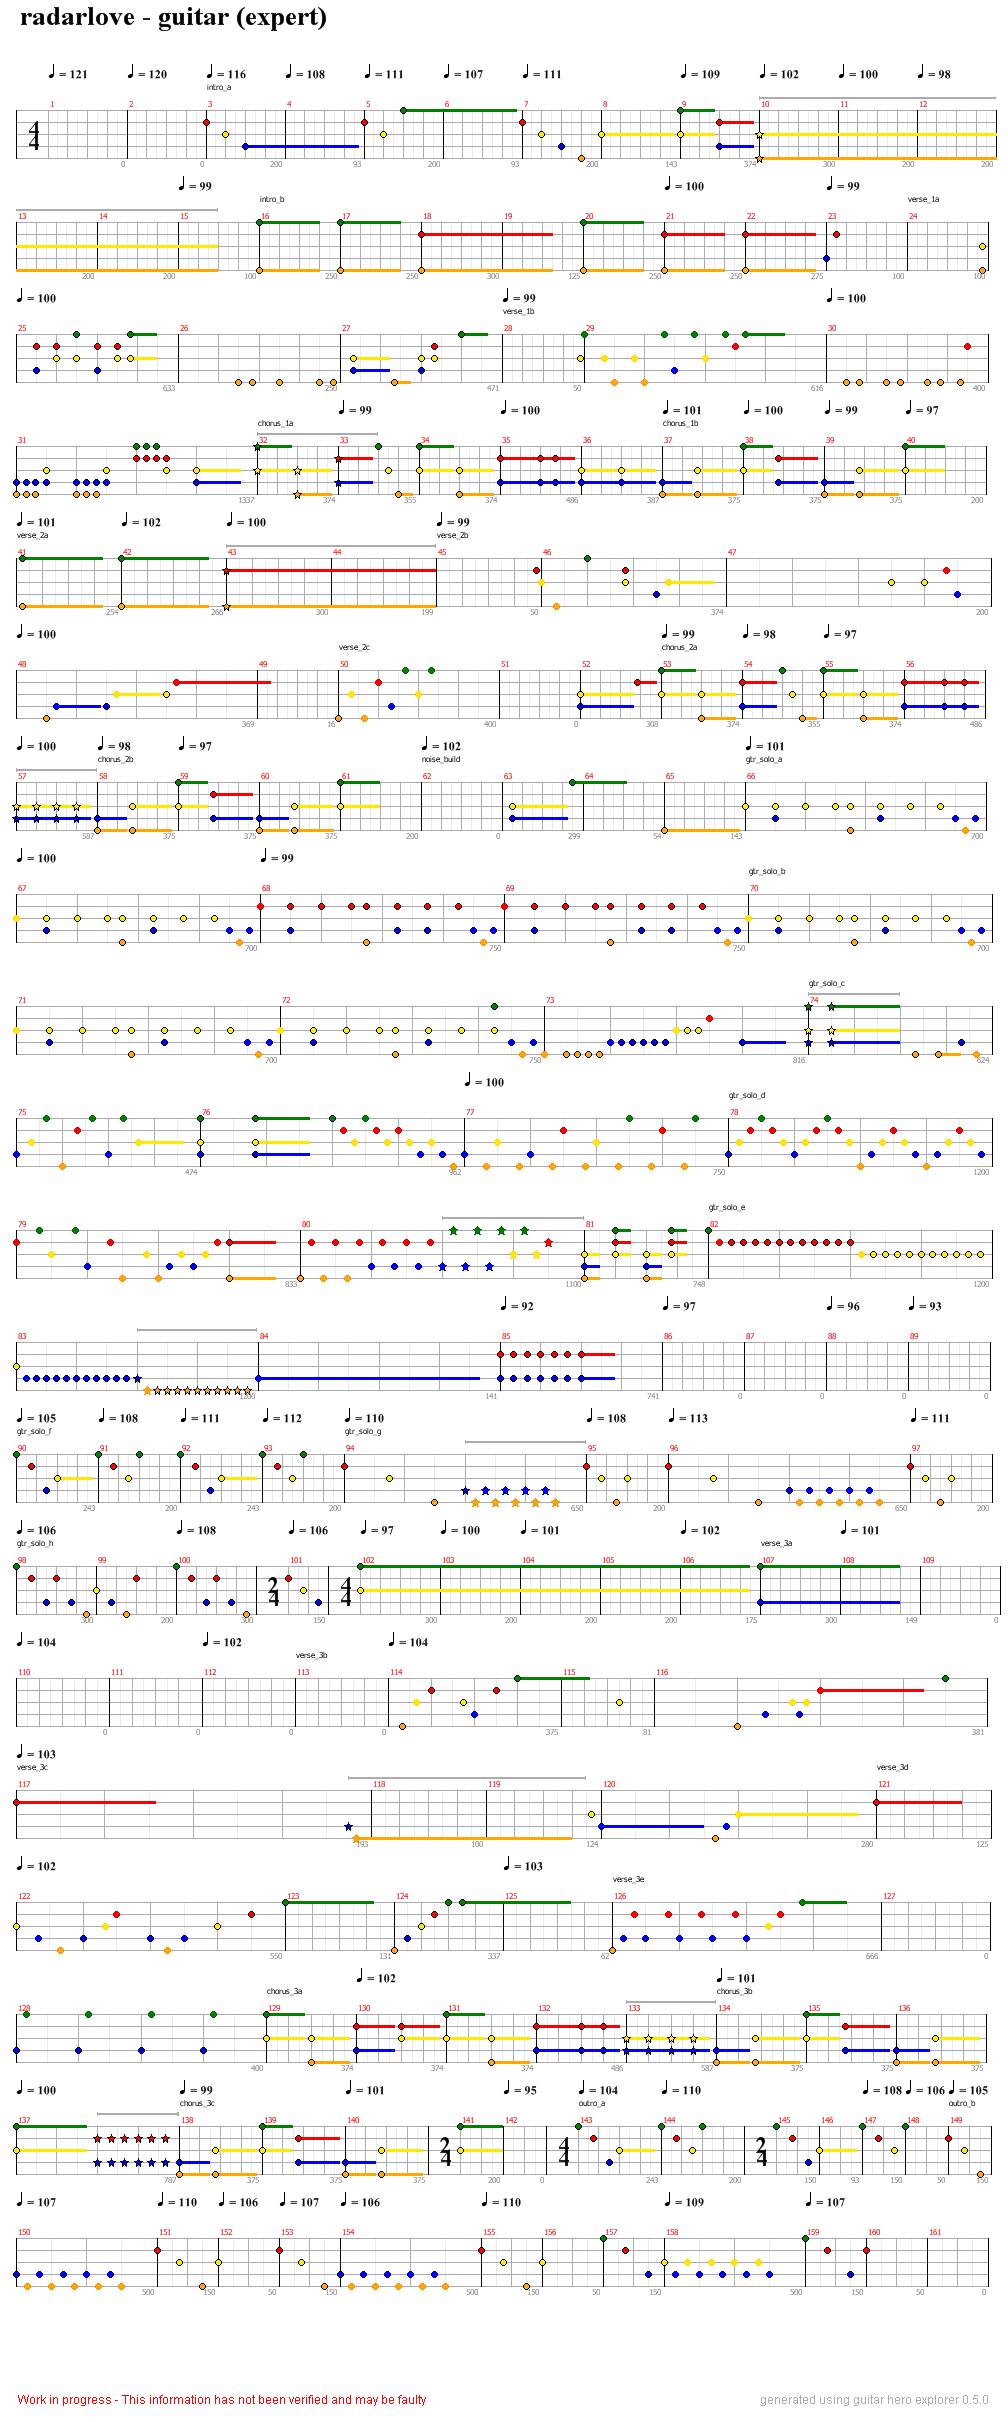 Scorehero wiki interesting information about guitar hero 2080 nps measure 116 hexwebz Gallery